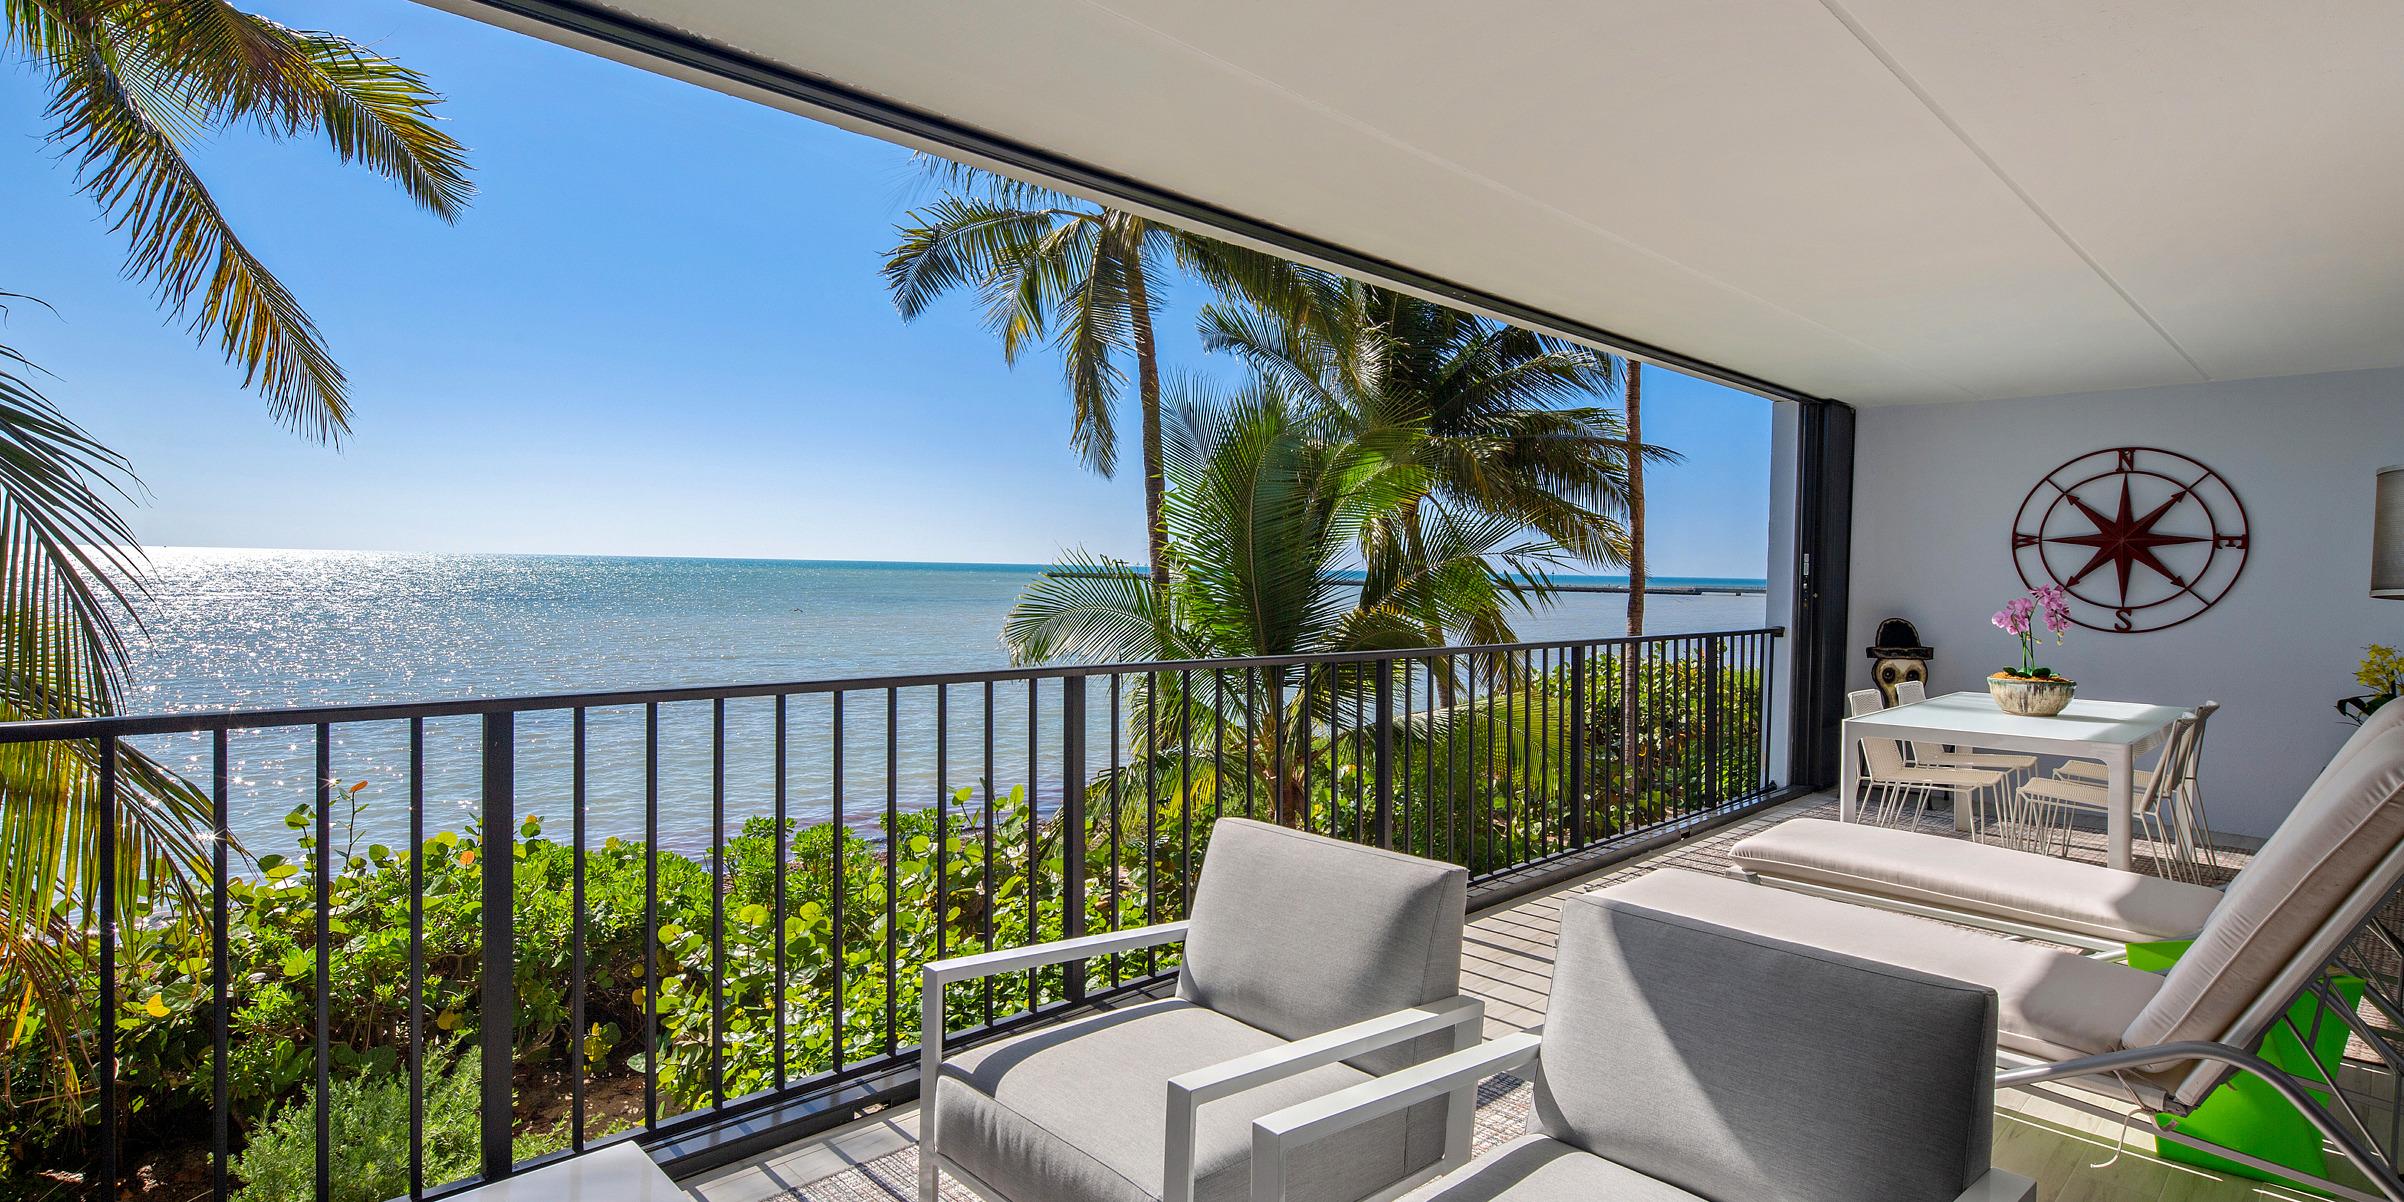 1500 Atlantic Blvd. #107, Key West